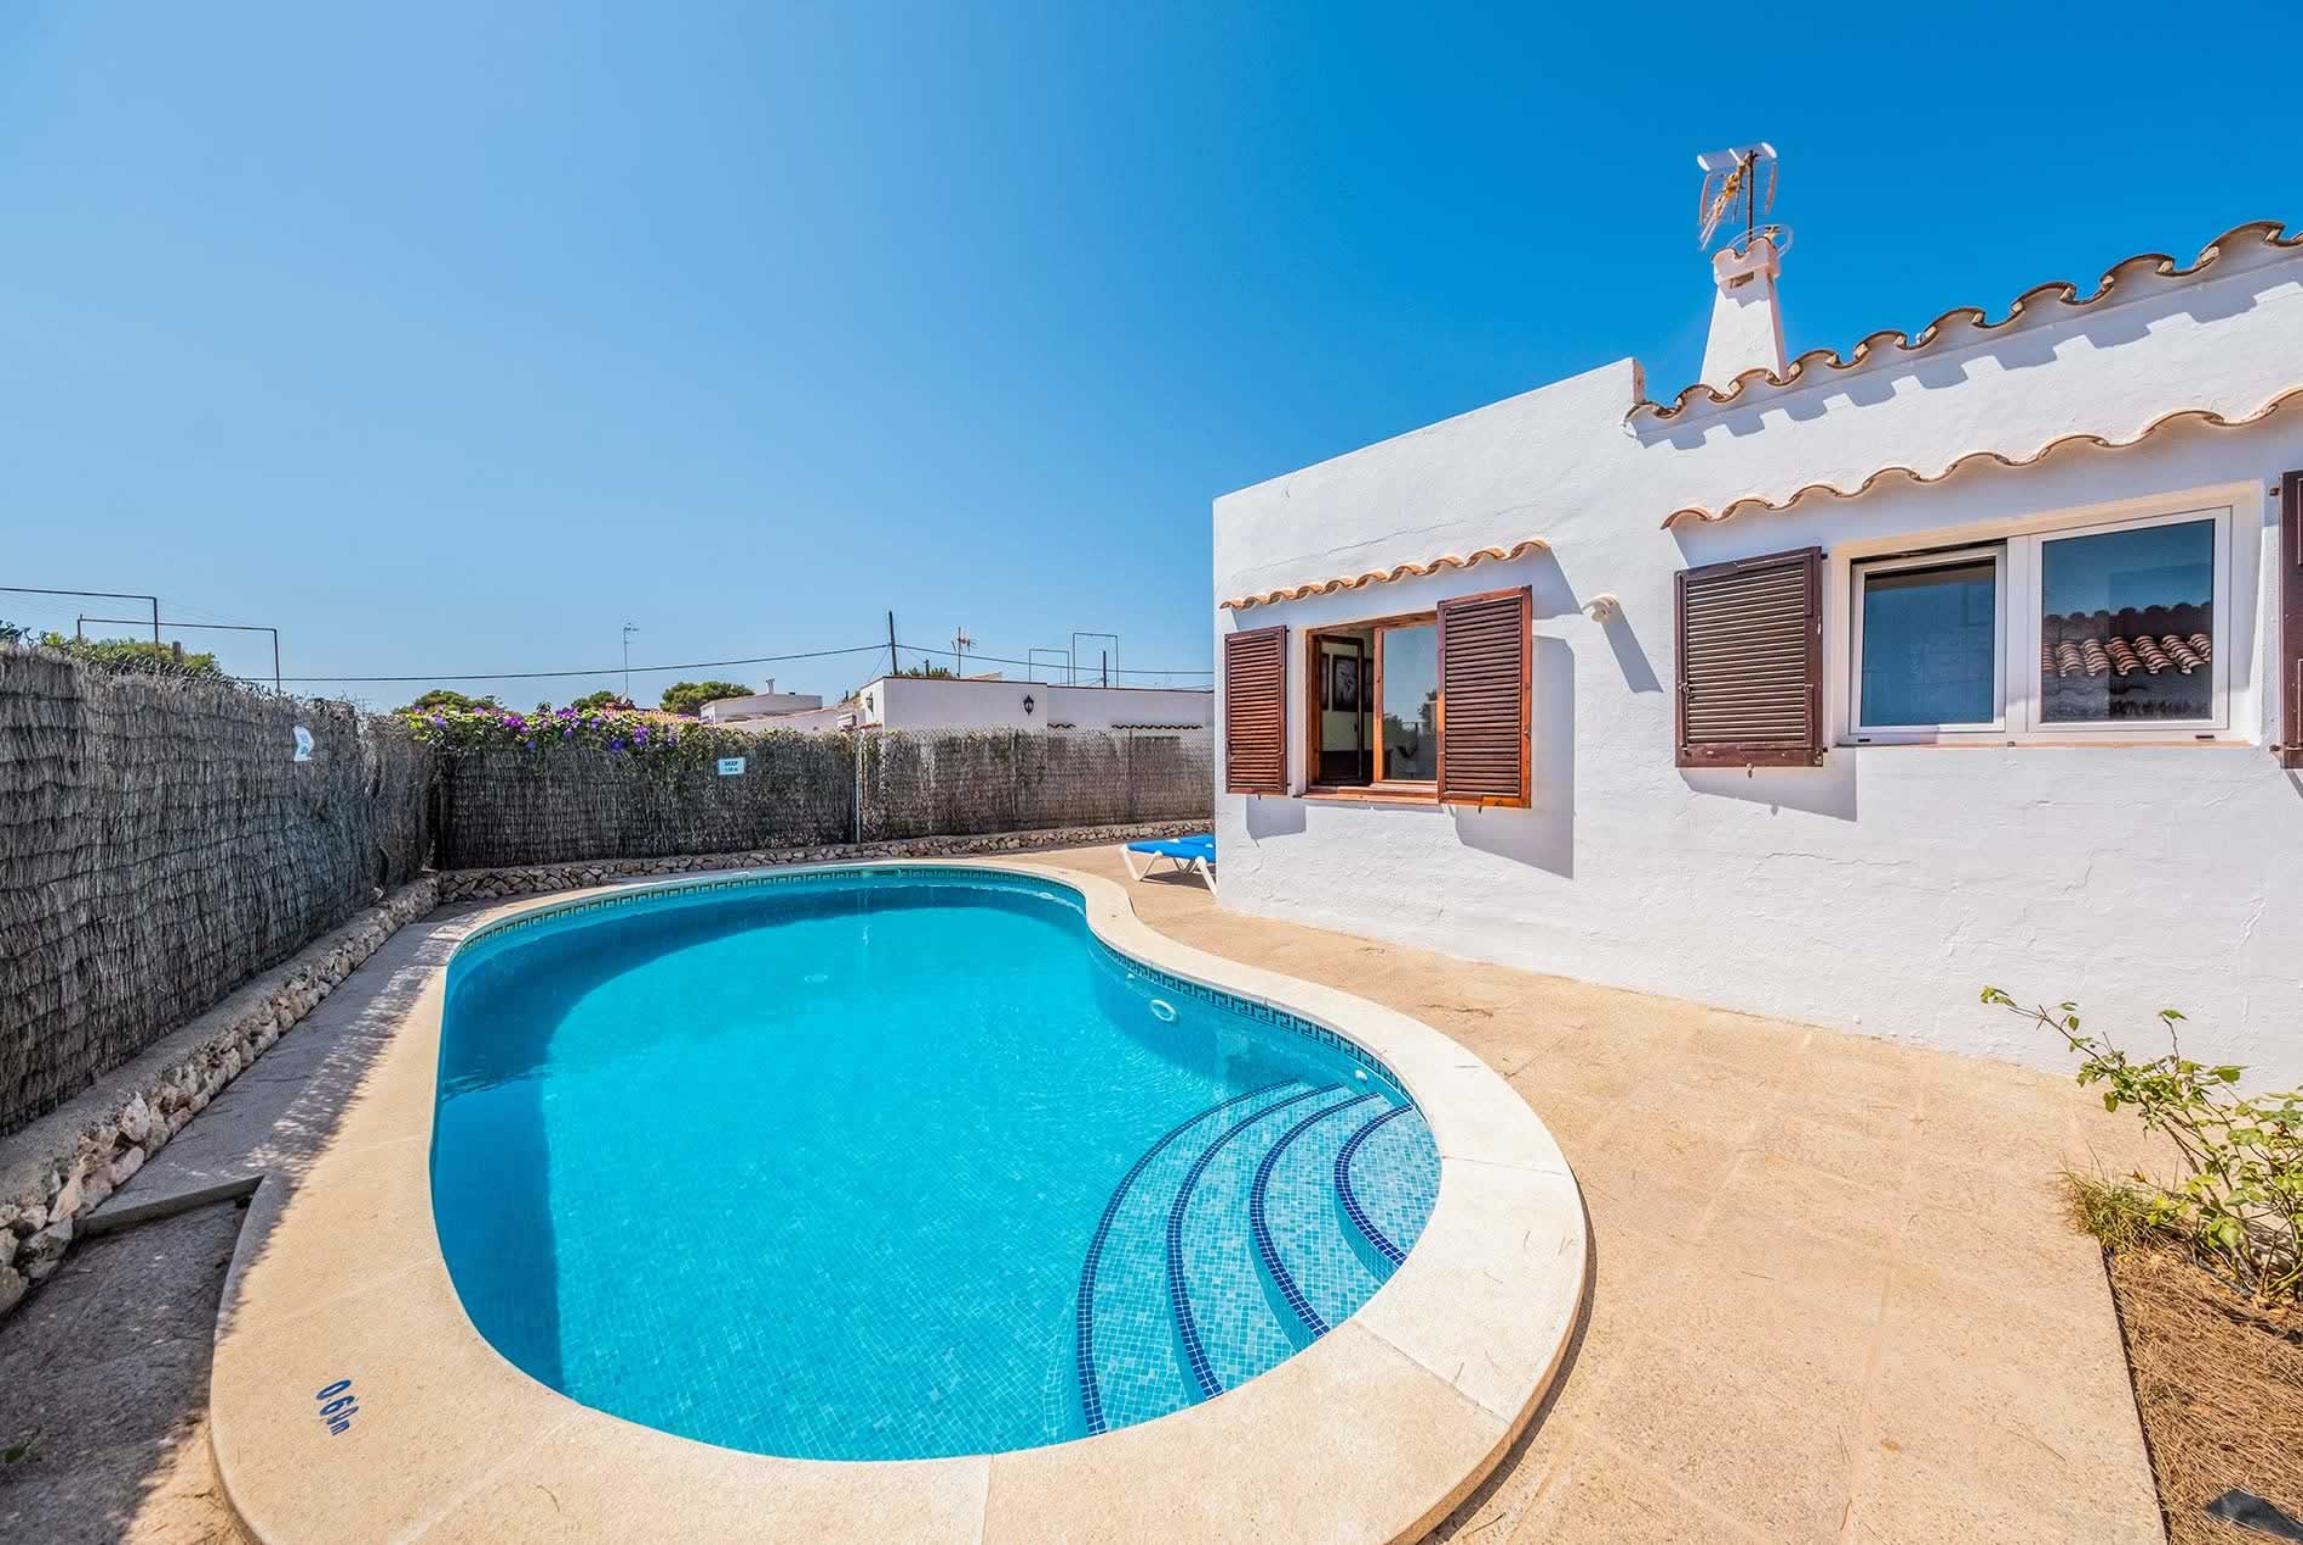 Ferienhaus Iris Prima (2653680), Punta Prima, Menorca, Balearische Inseln, Spanien, Bild 22